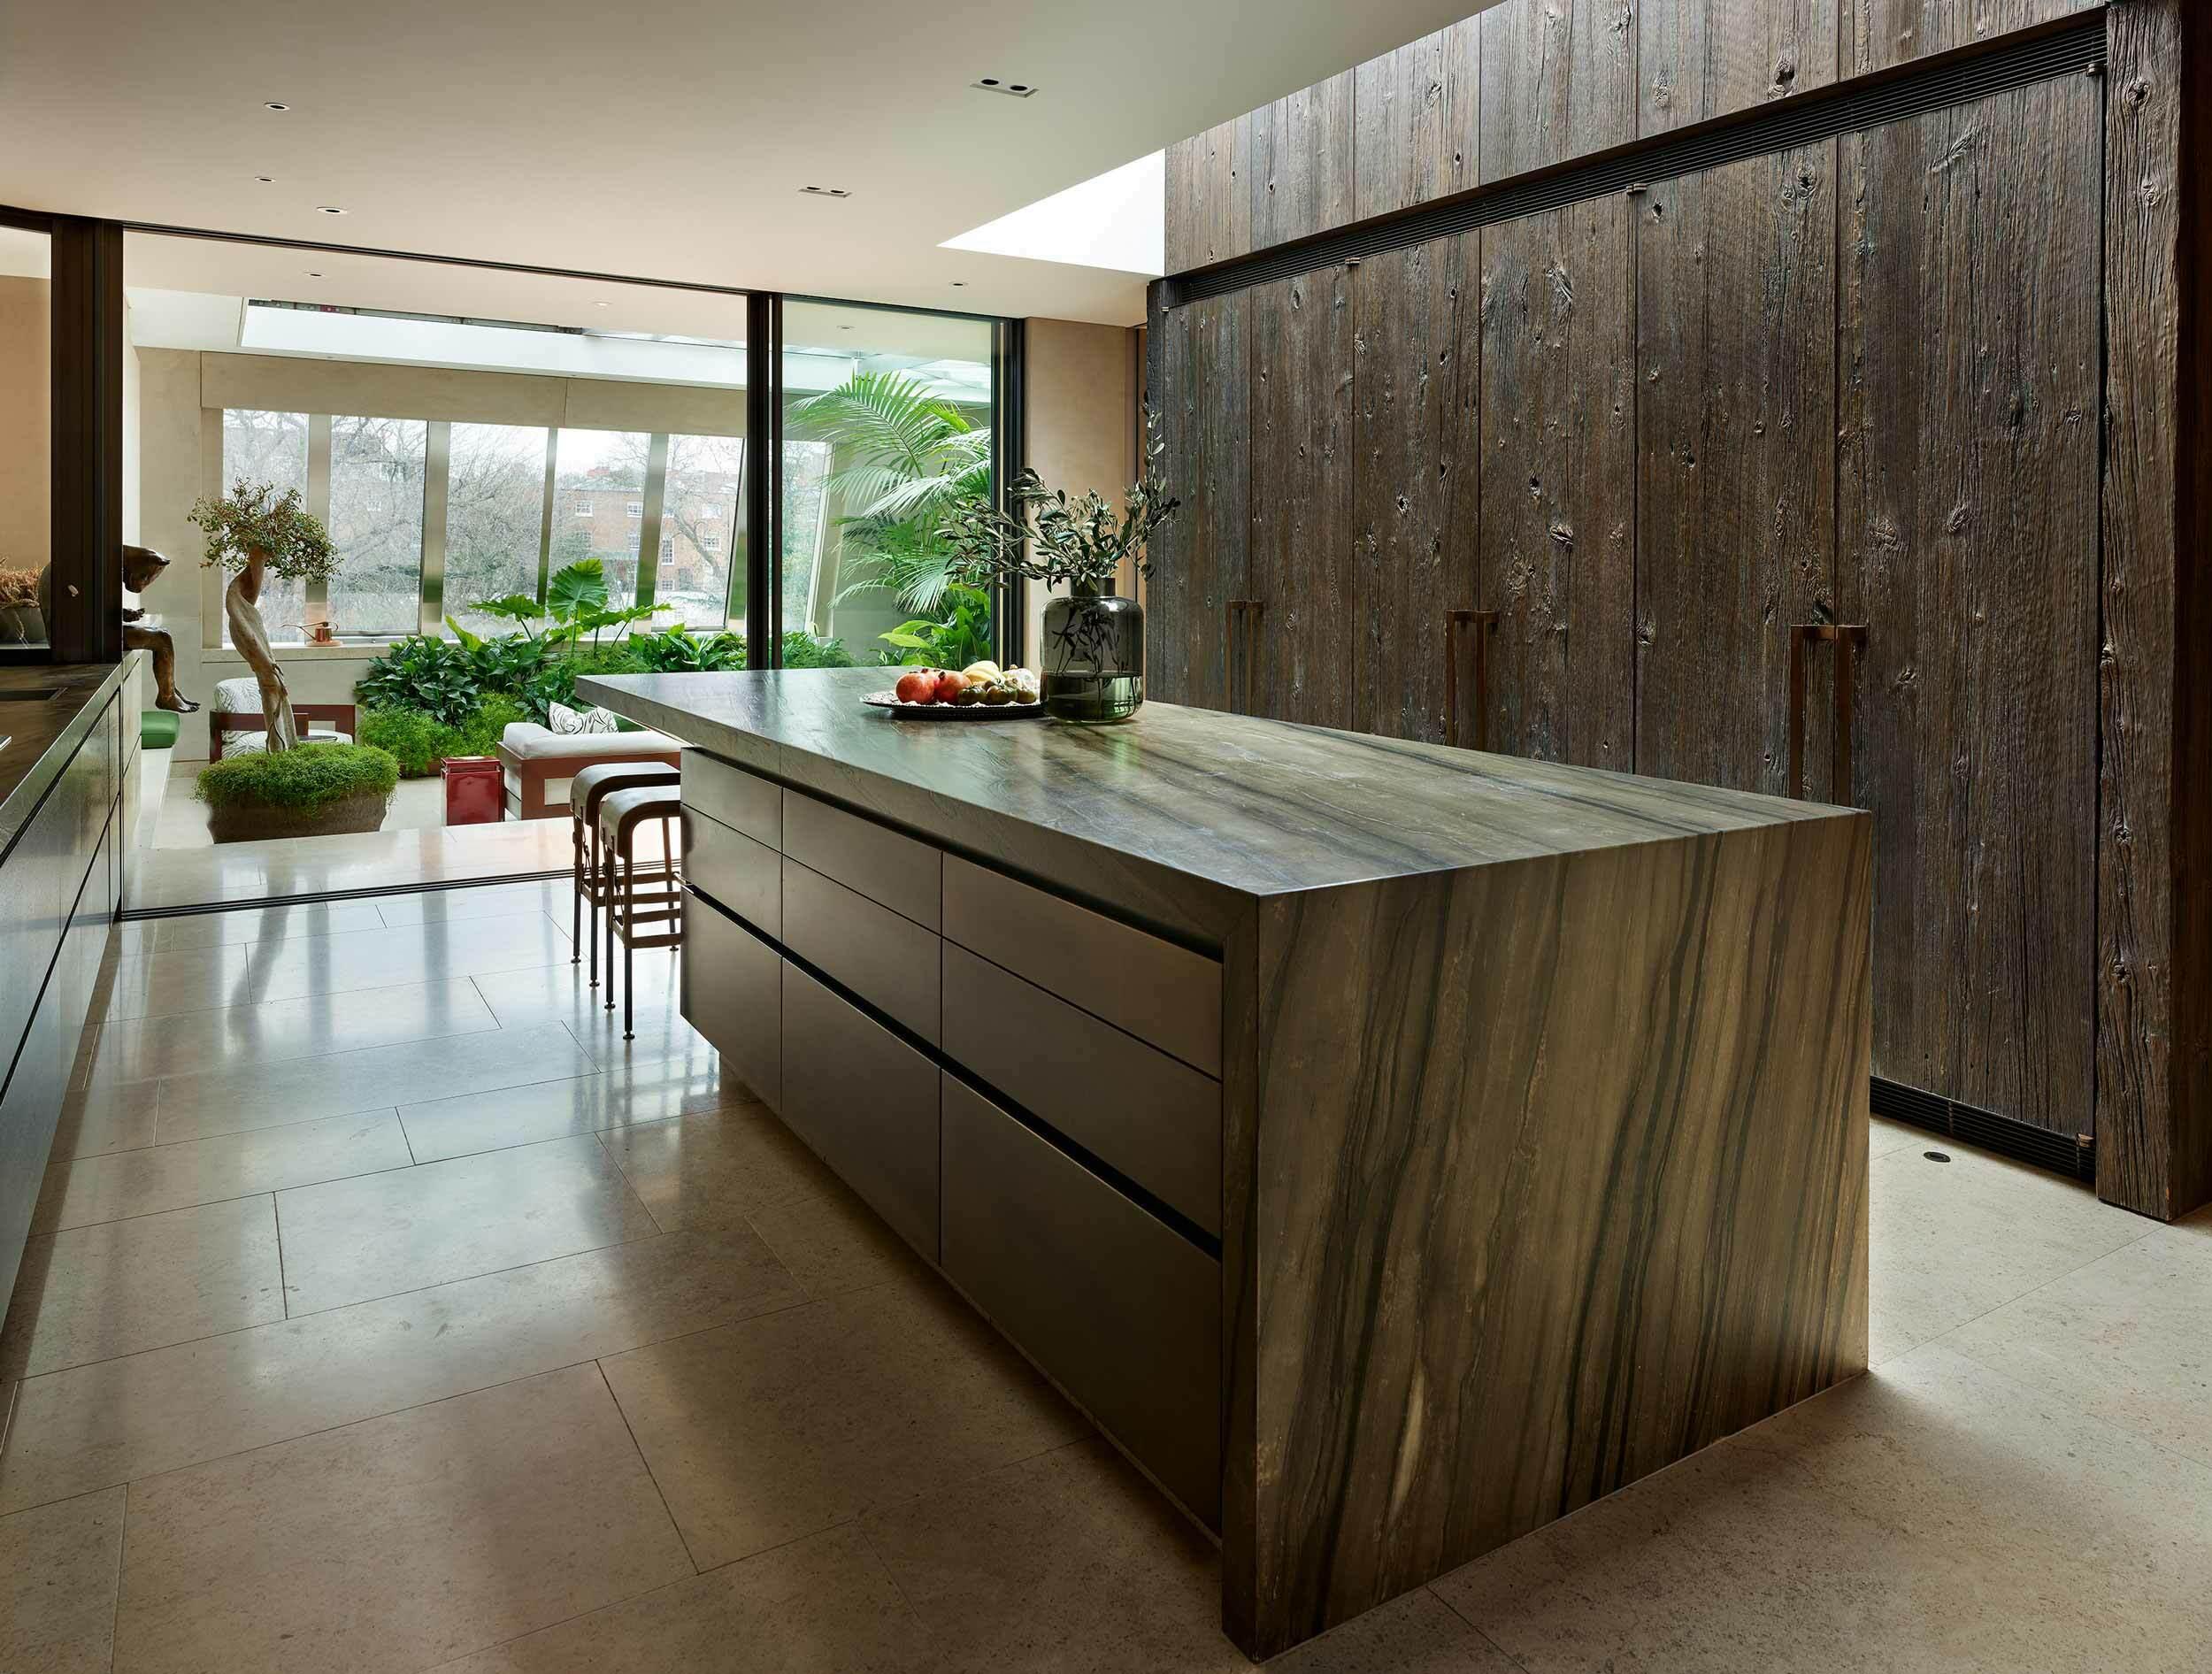 Kitchens_27.jpg